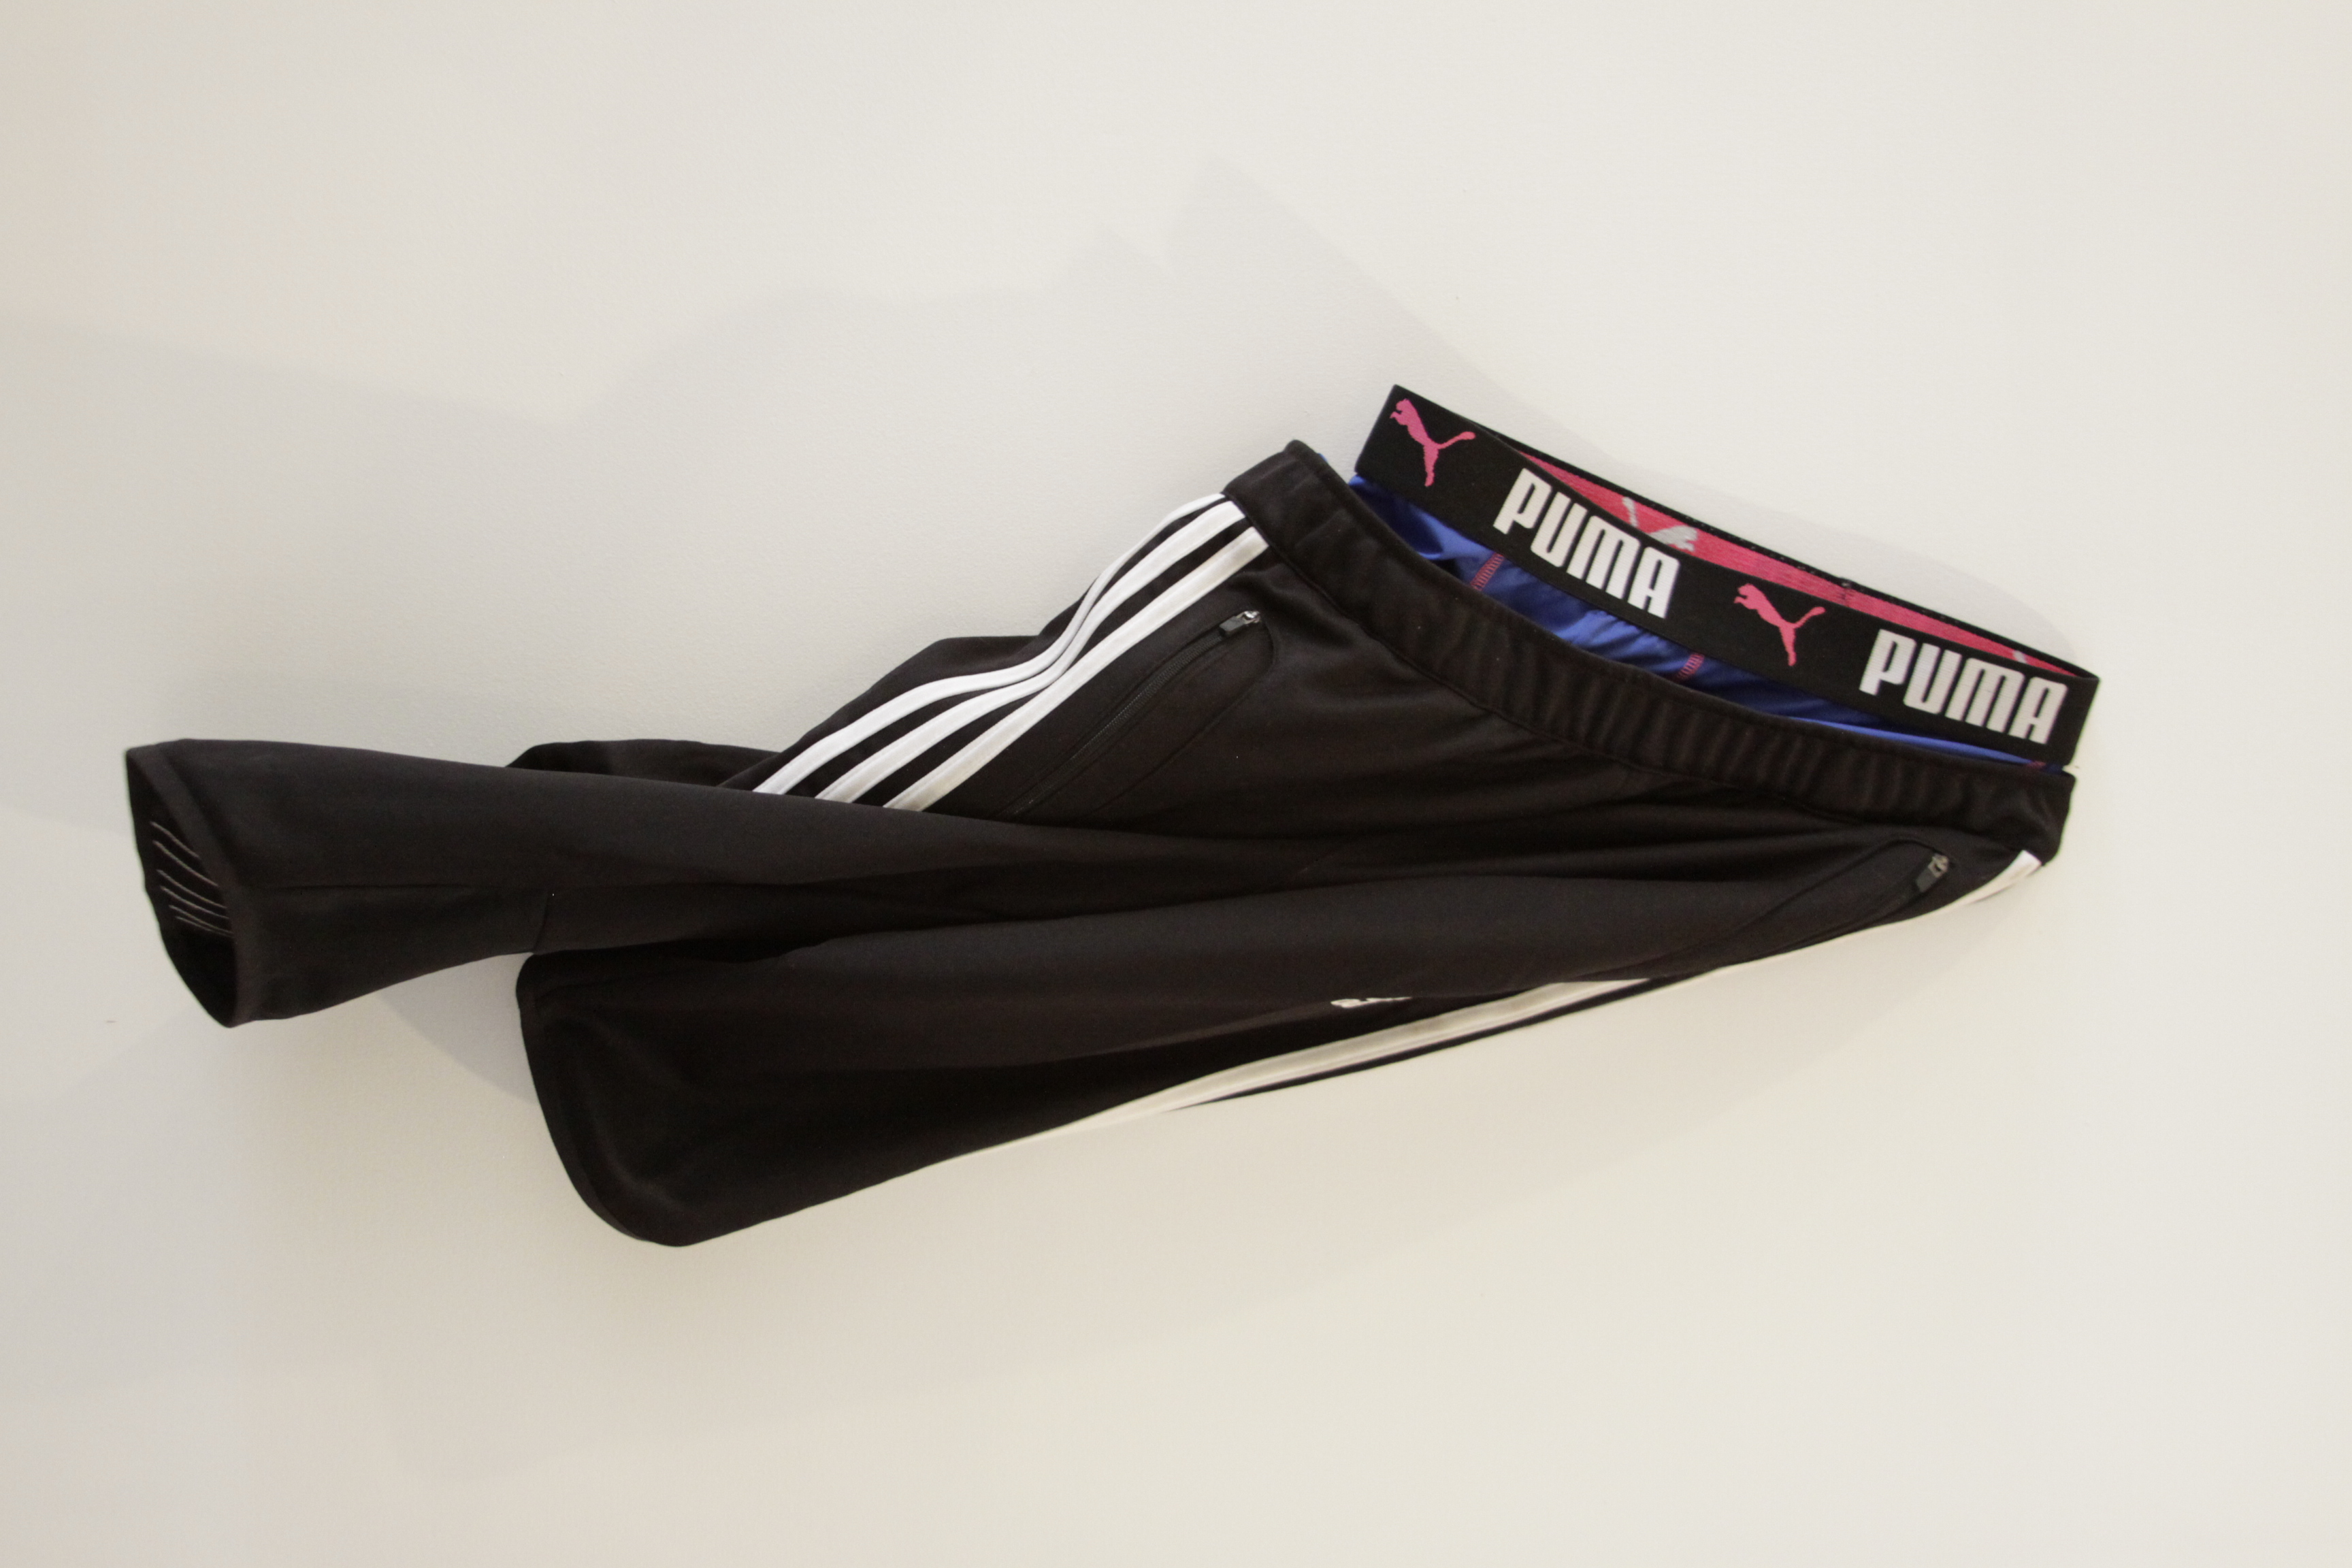 "Hung  adidas Three-Quarter Men's Track Pants, Puma Athletic Boxer Briefs 36"" x 18"" 2015"